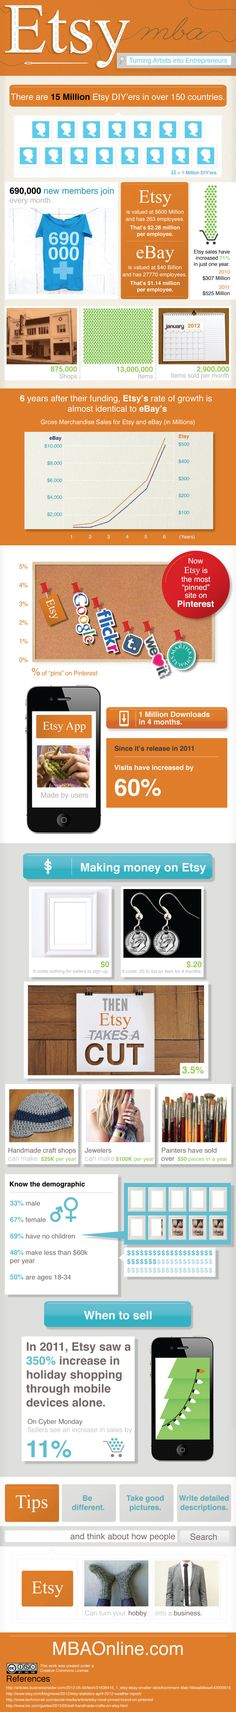 Etsy: Turning Artists Into Entrepreneurs [INFOGRAPHIC]